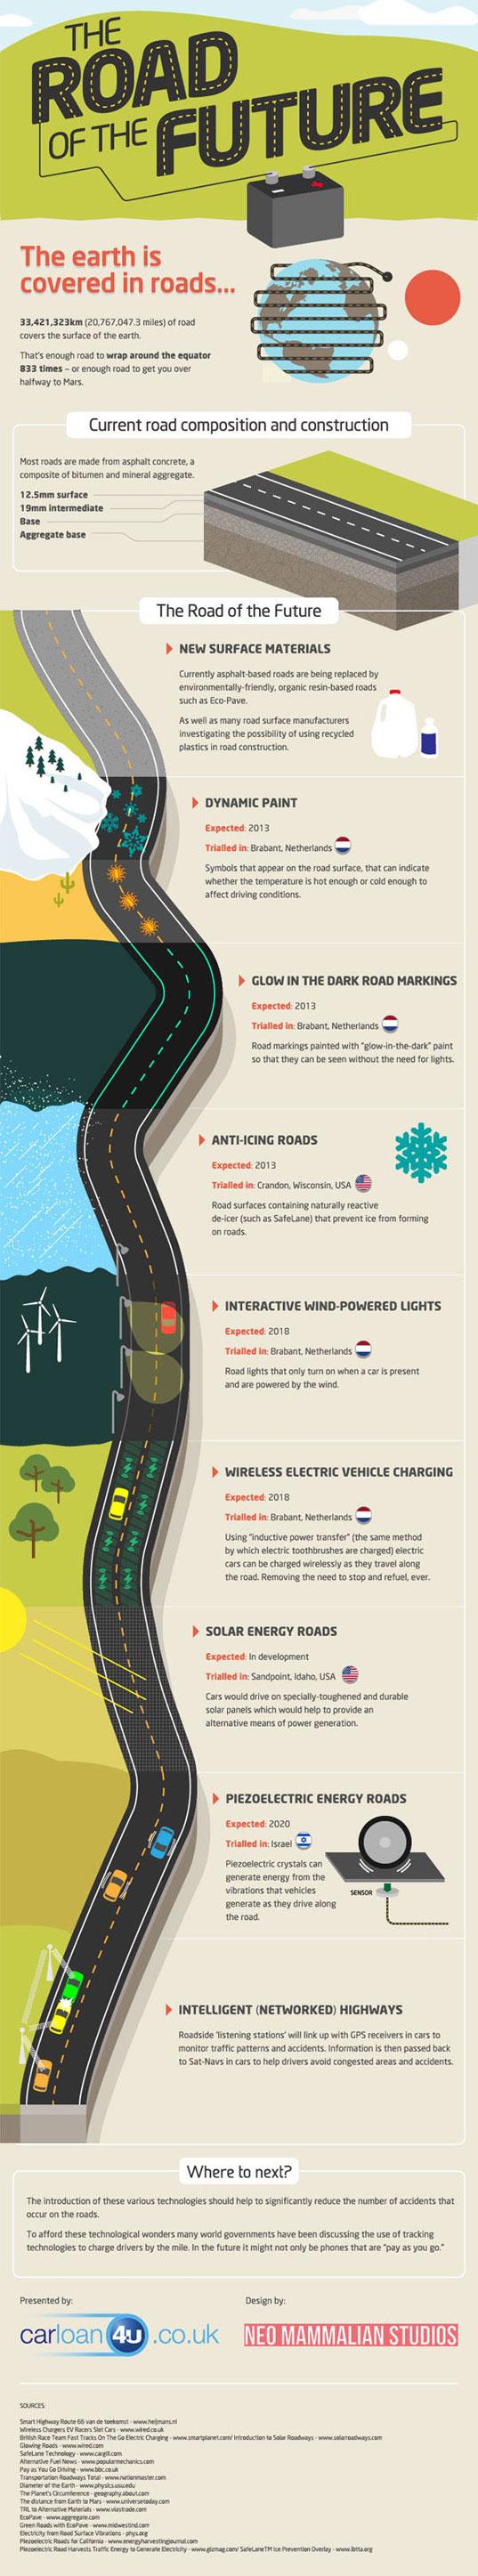 Future Road Technologies